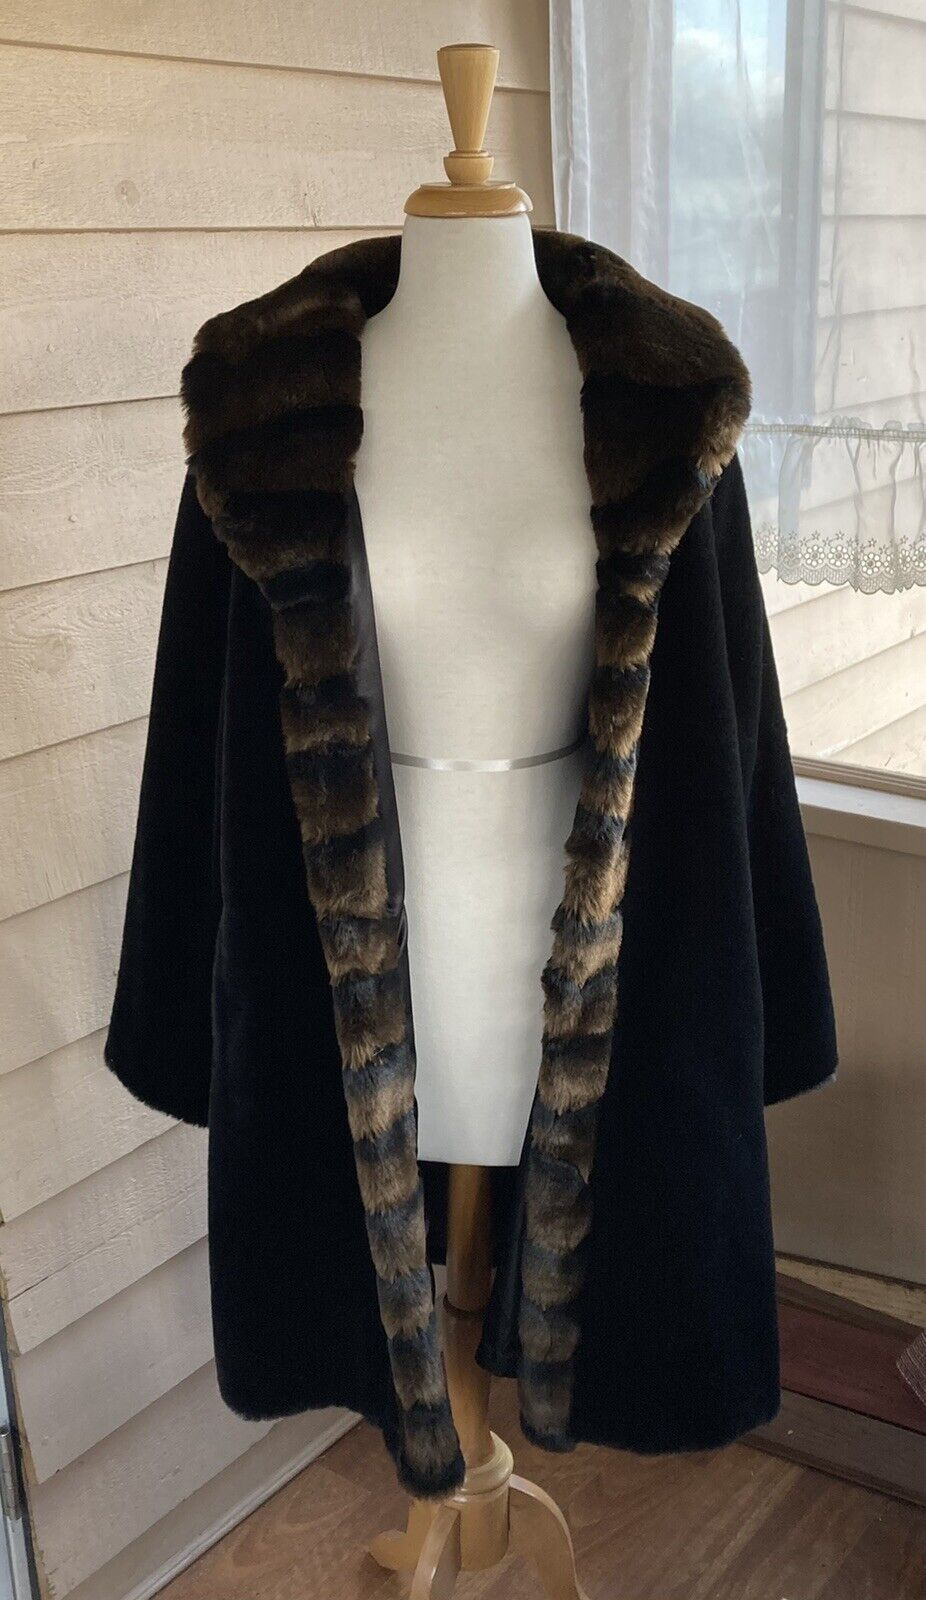 1 Madison Heavy Faux Fur Coat Black Brown Vintage Long Warm Pockets Sz XL Lined